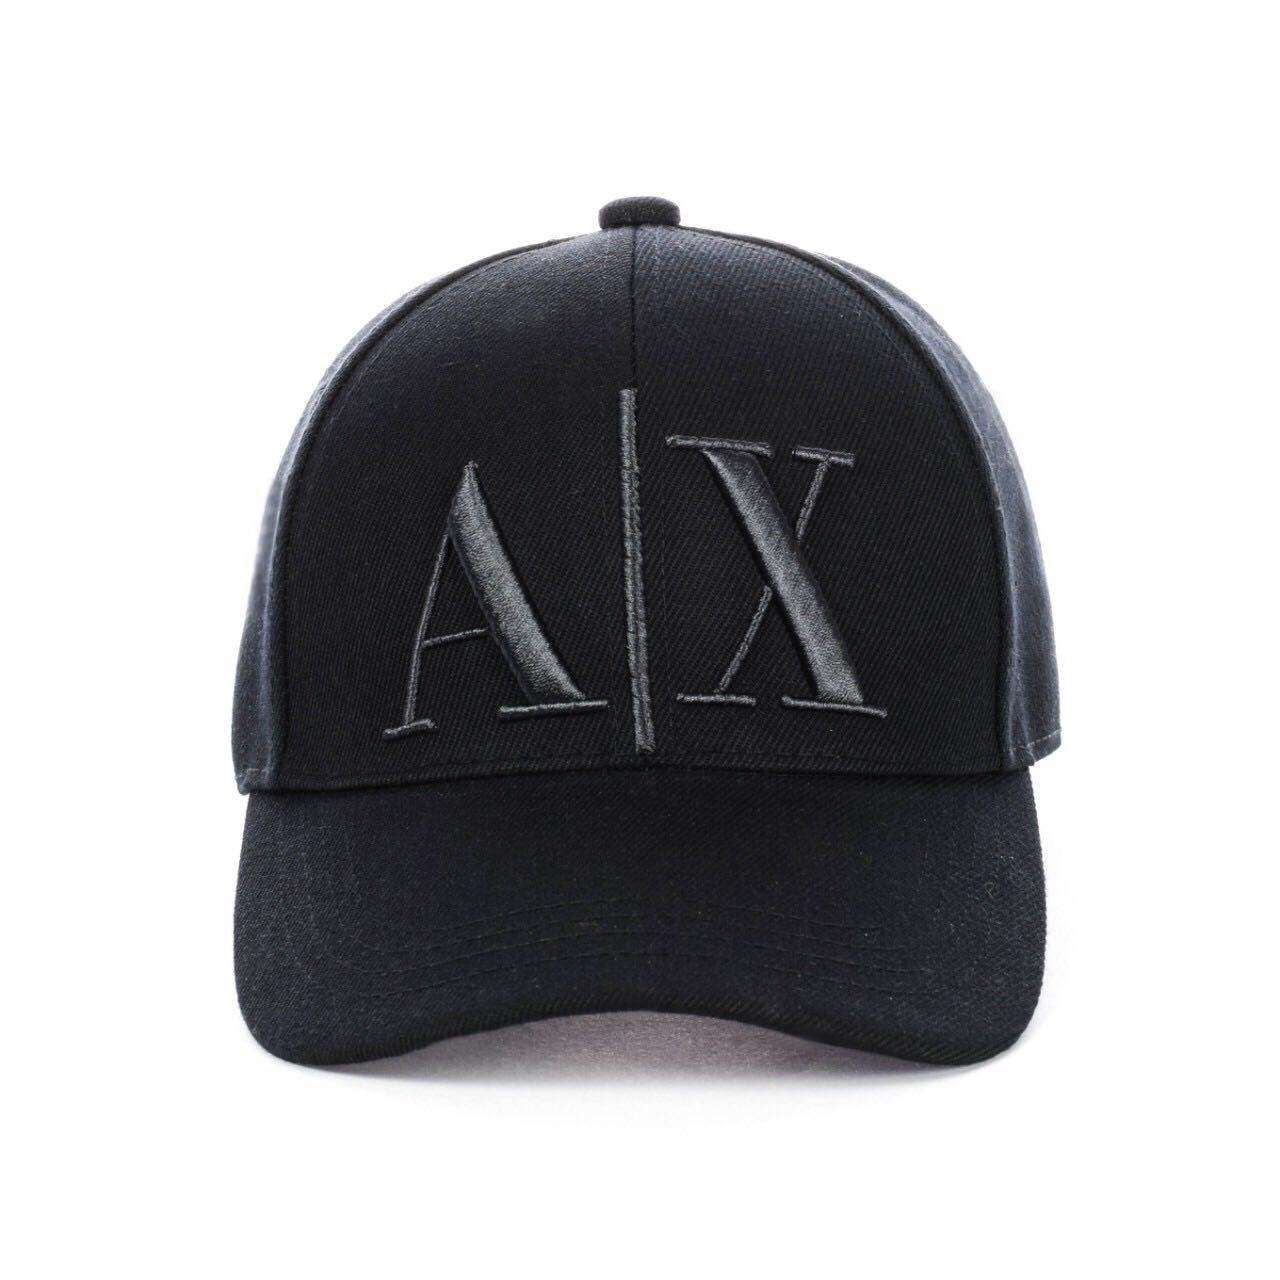 Кепка- Бейсболка Armani Exchange AlX